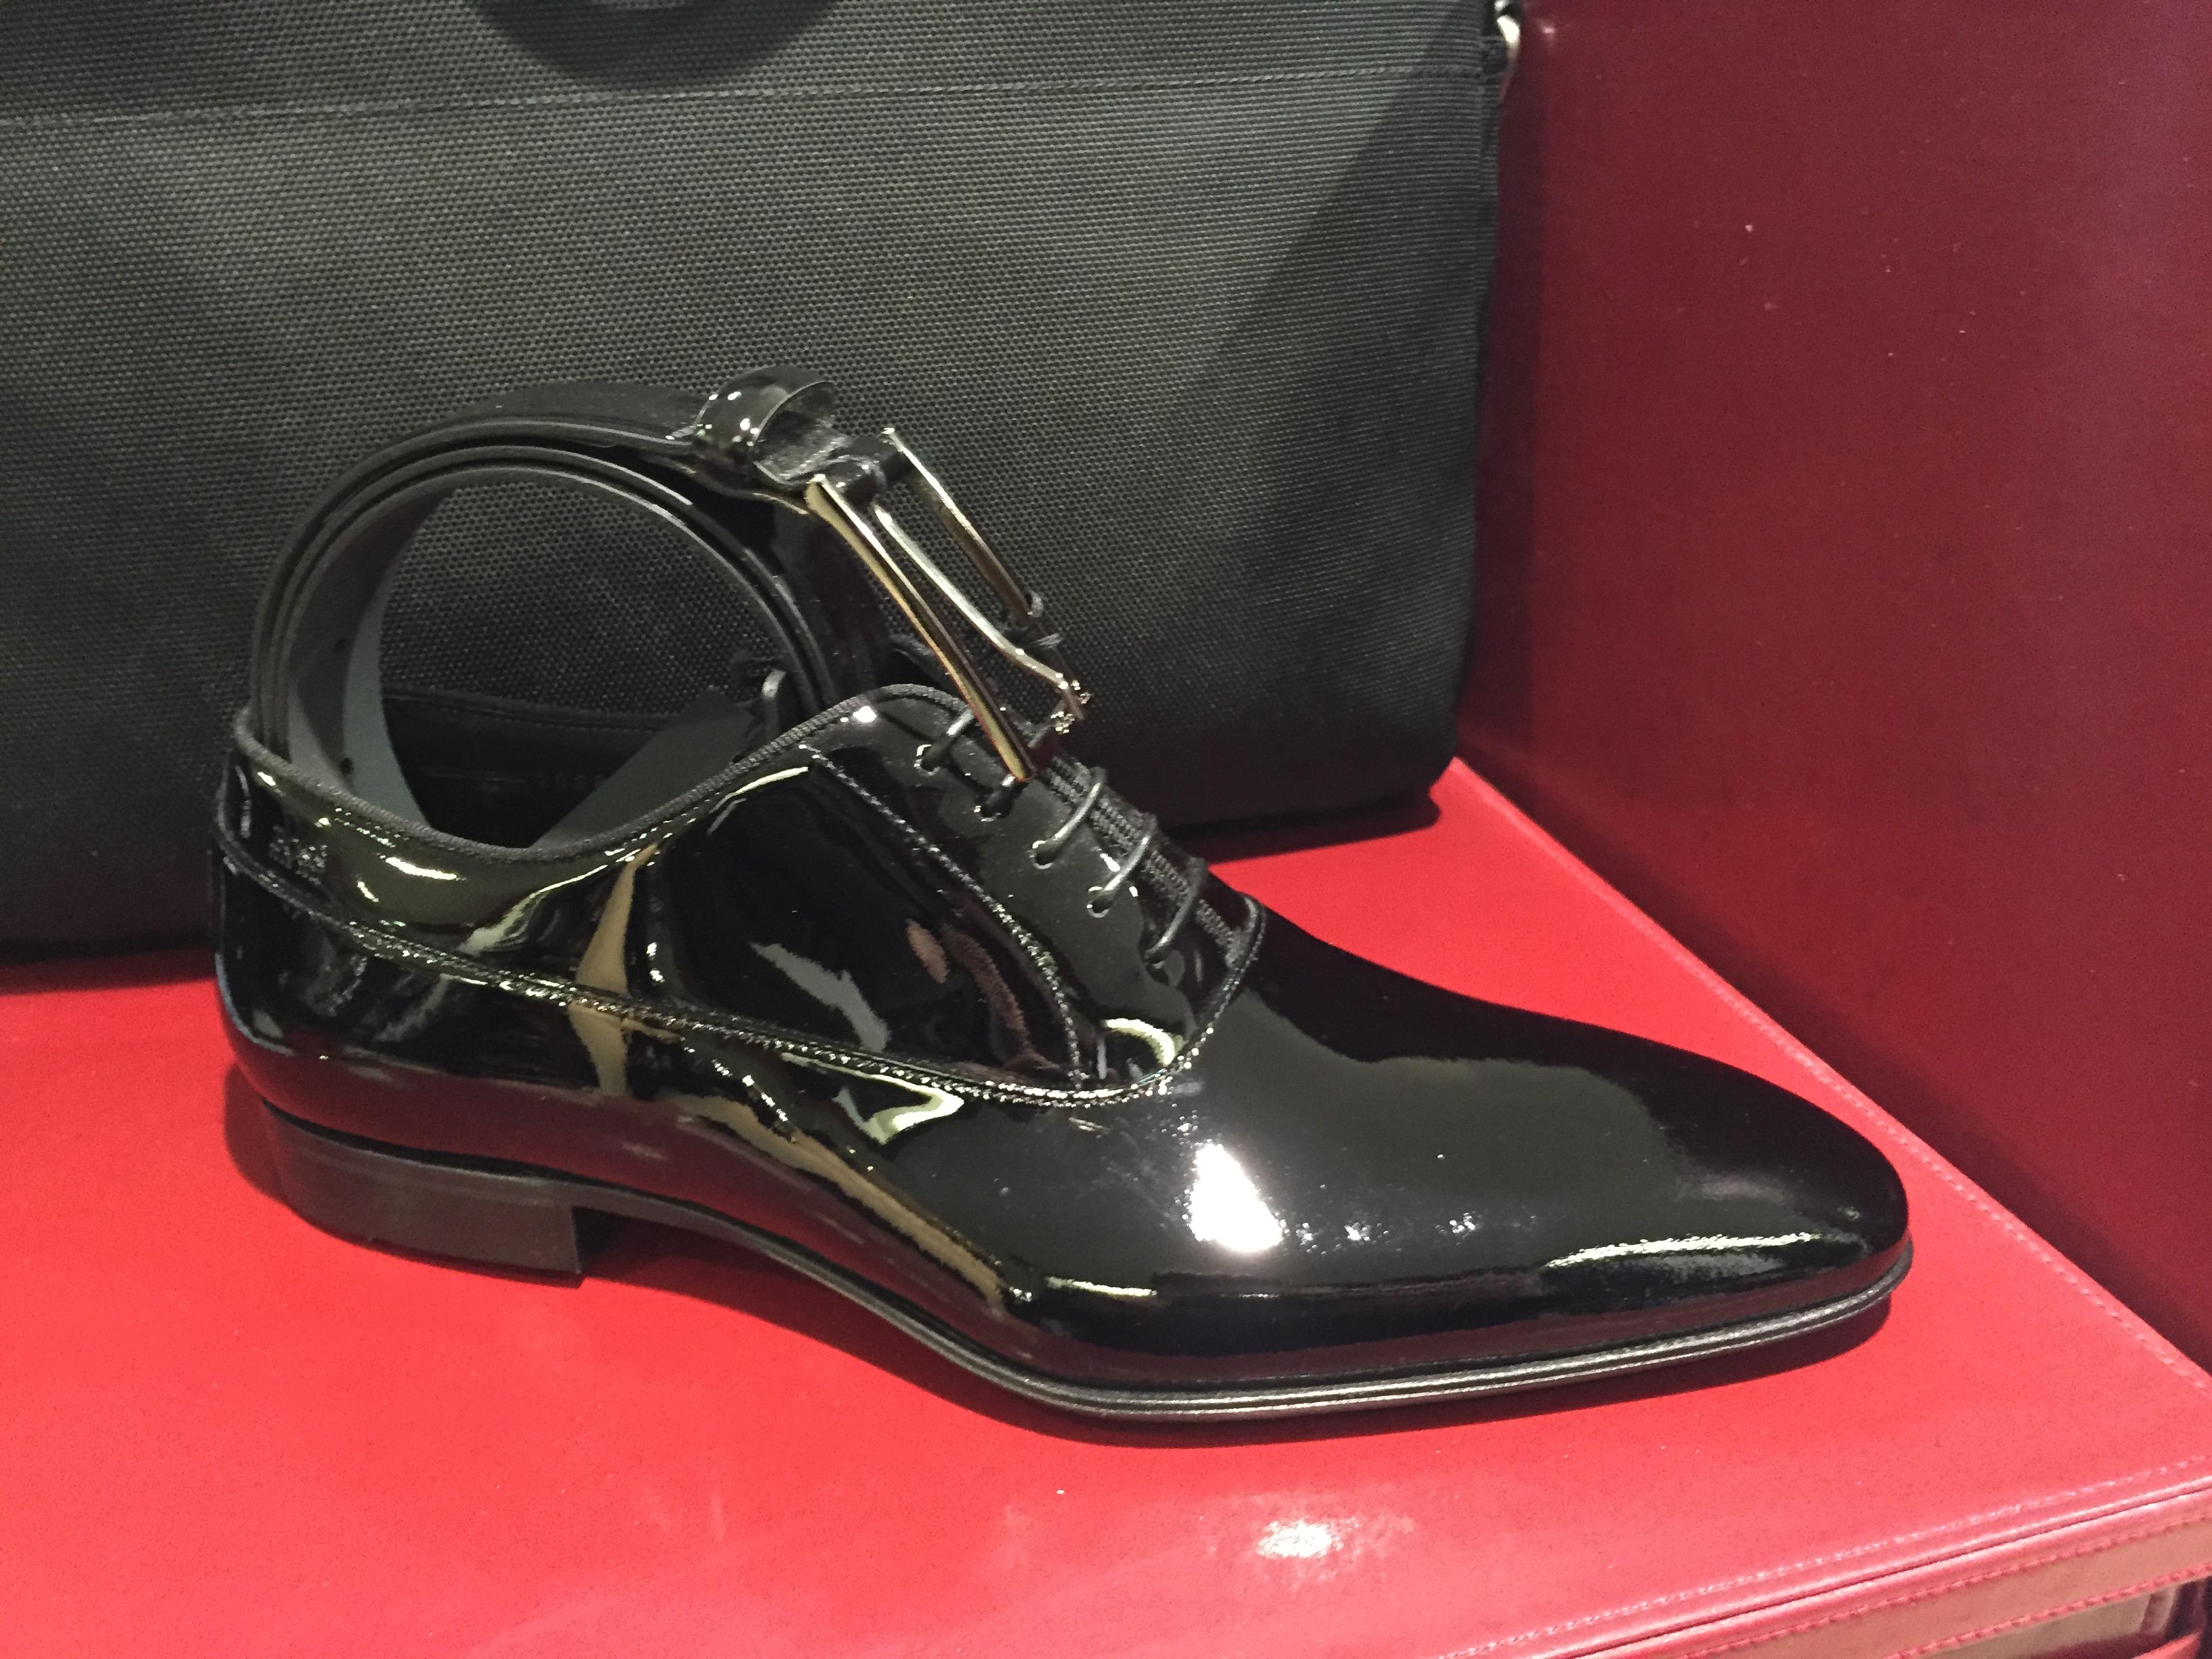 9637e72d2e0 Chaussure Jean de Sey Patric Boutique Lille-Seclin · zoom Chaussure Boss  Patric Boutique Lille-Seclin · zoom